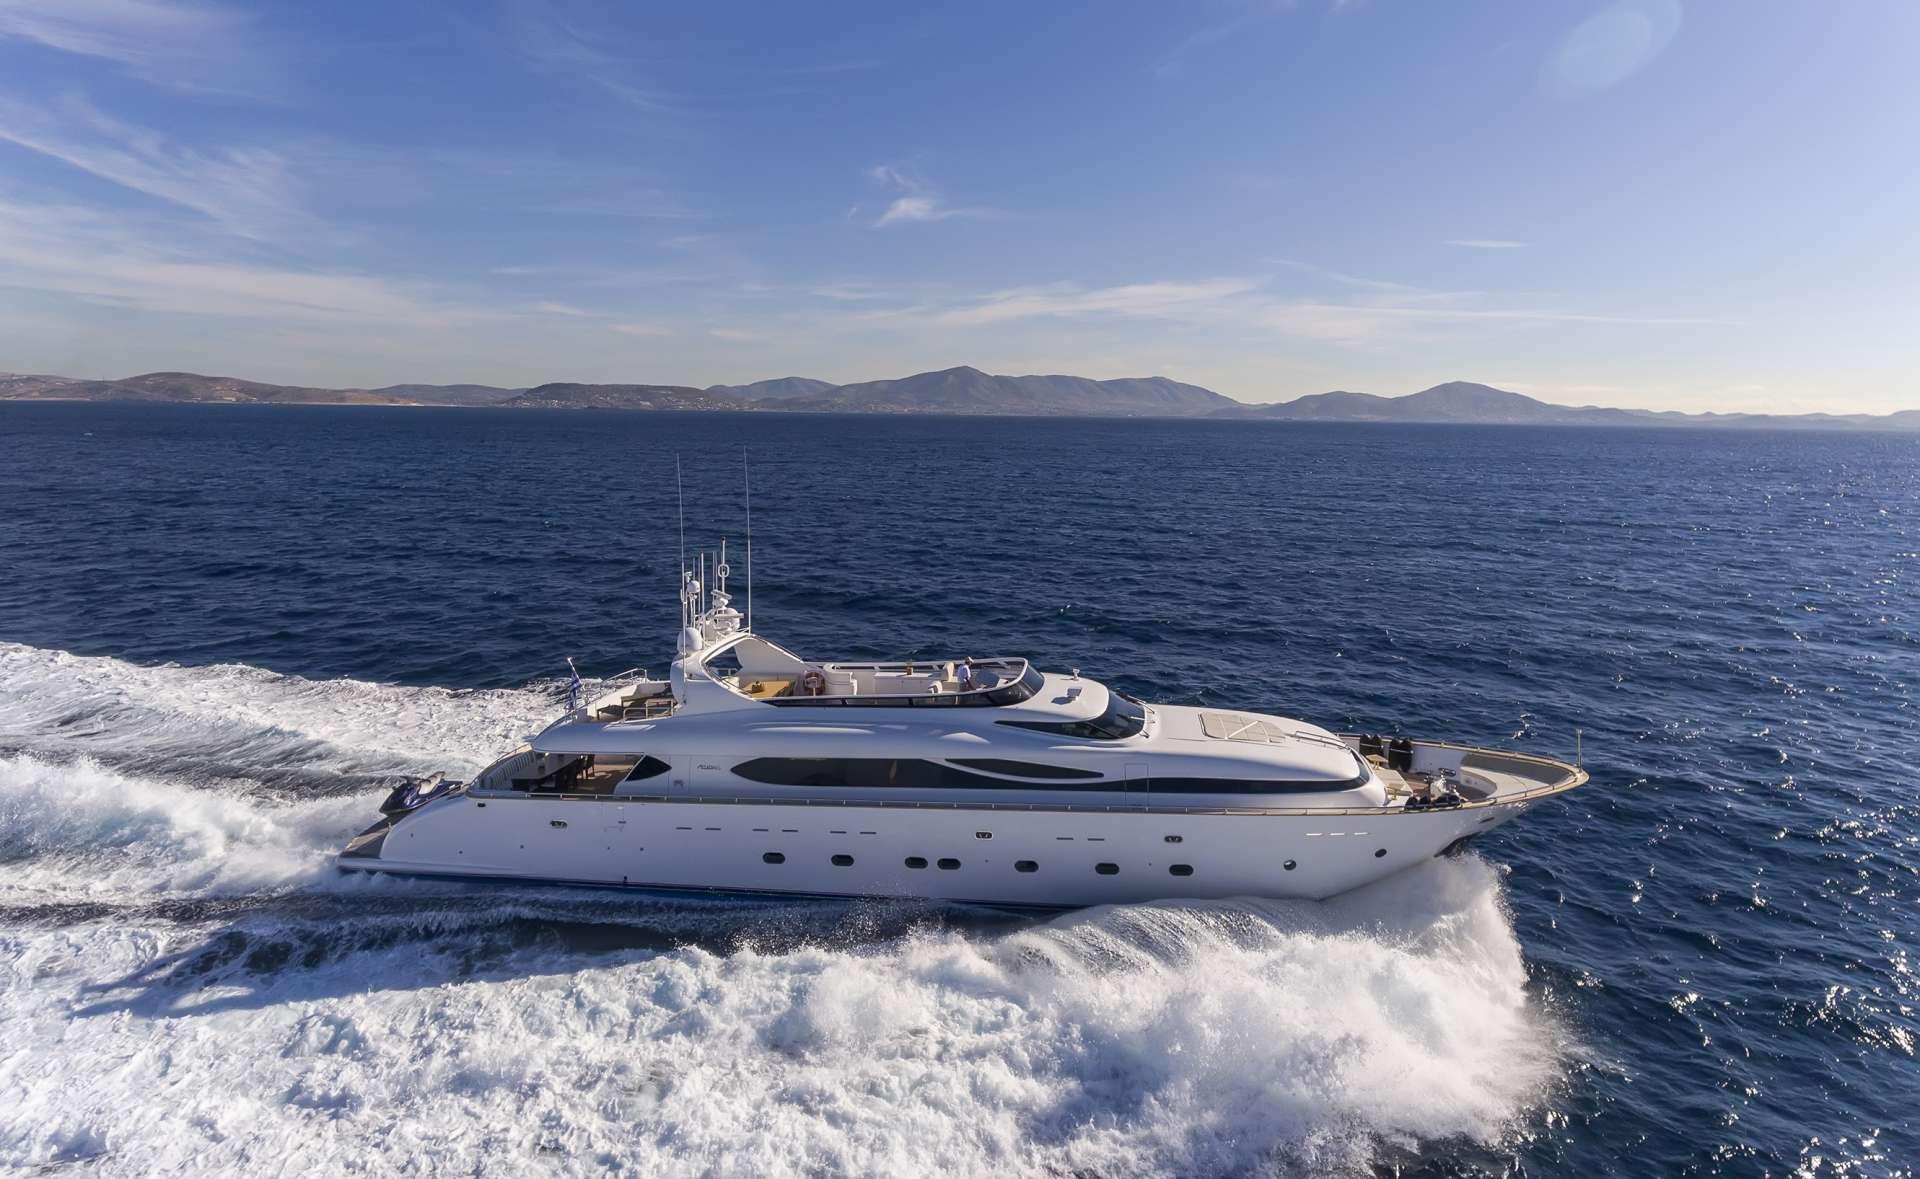 Main image of PARIS A yacht